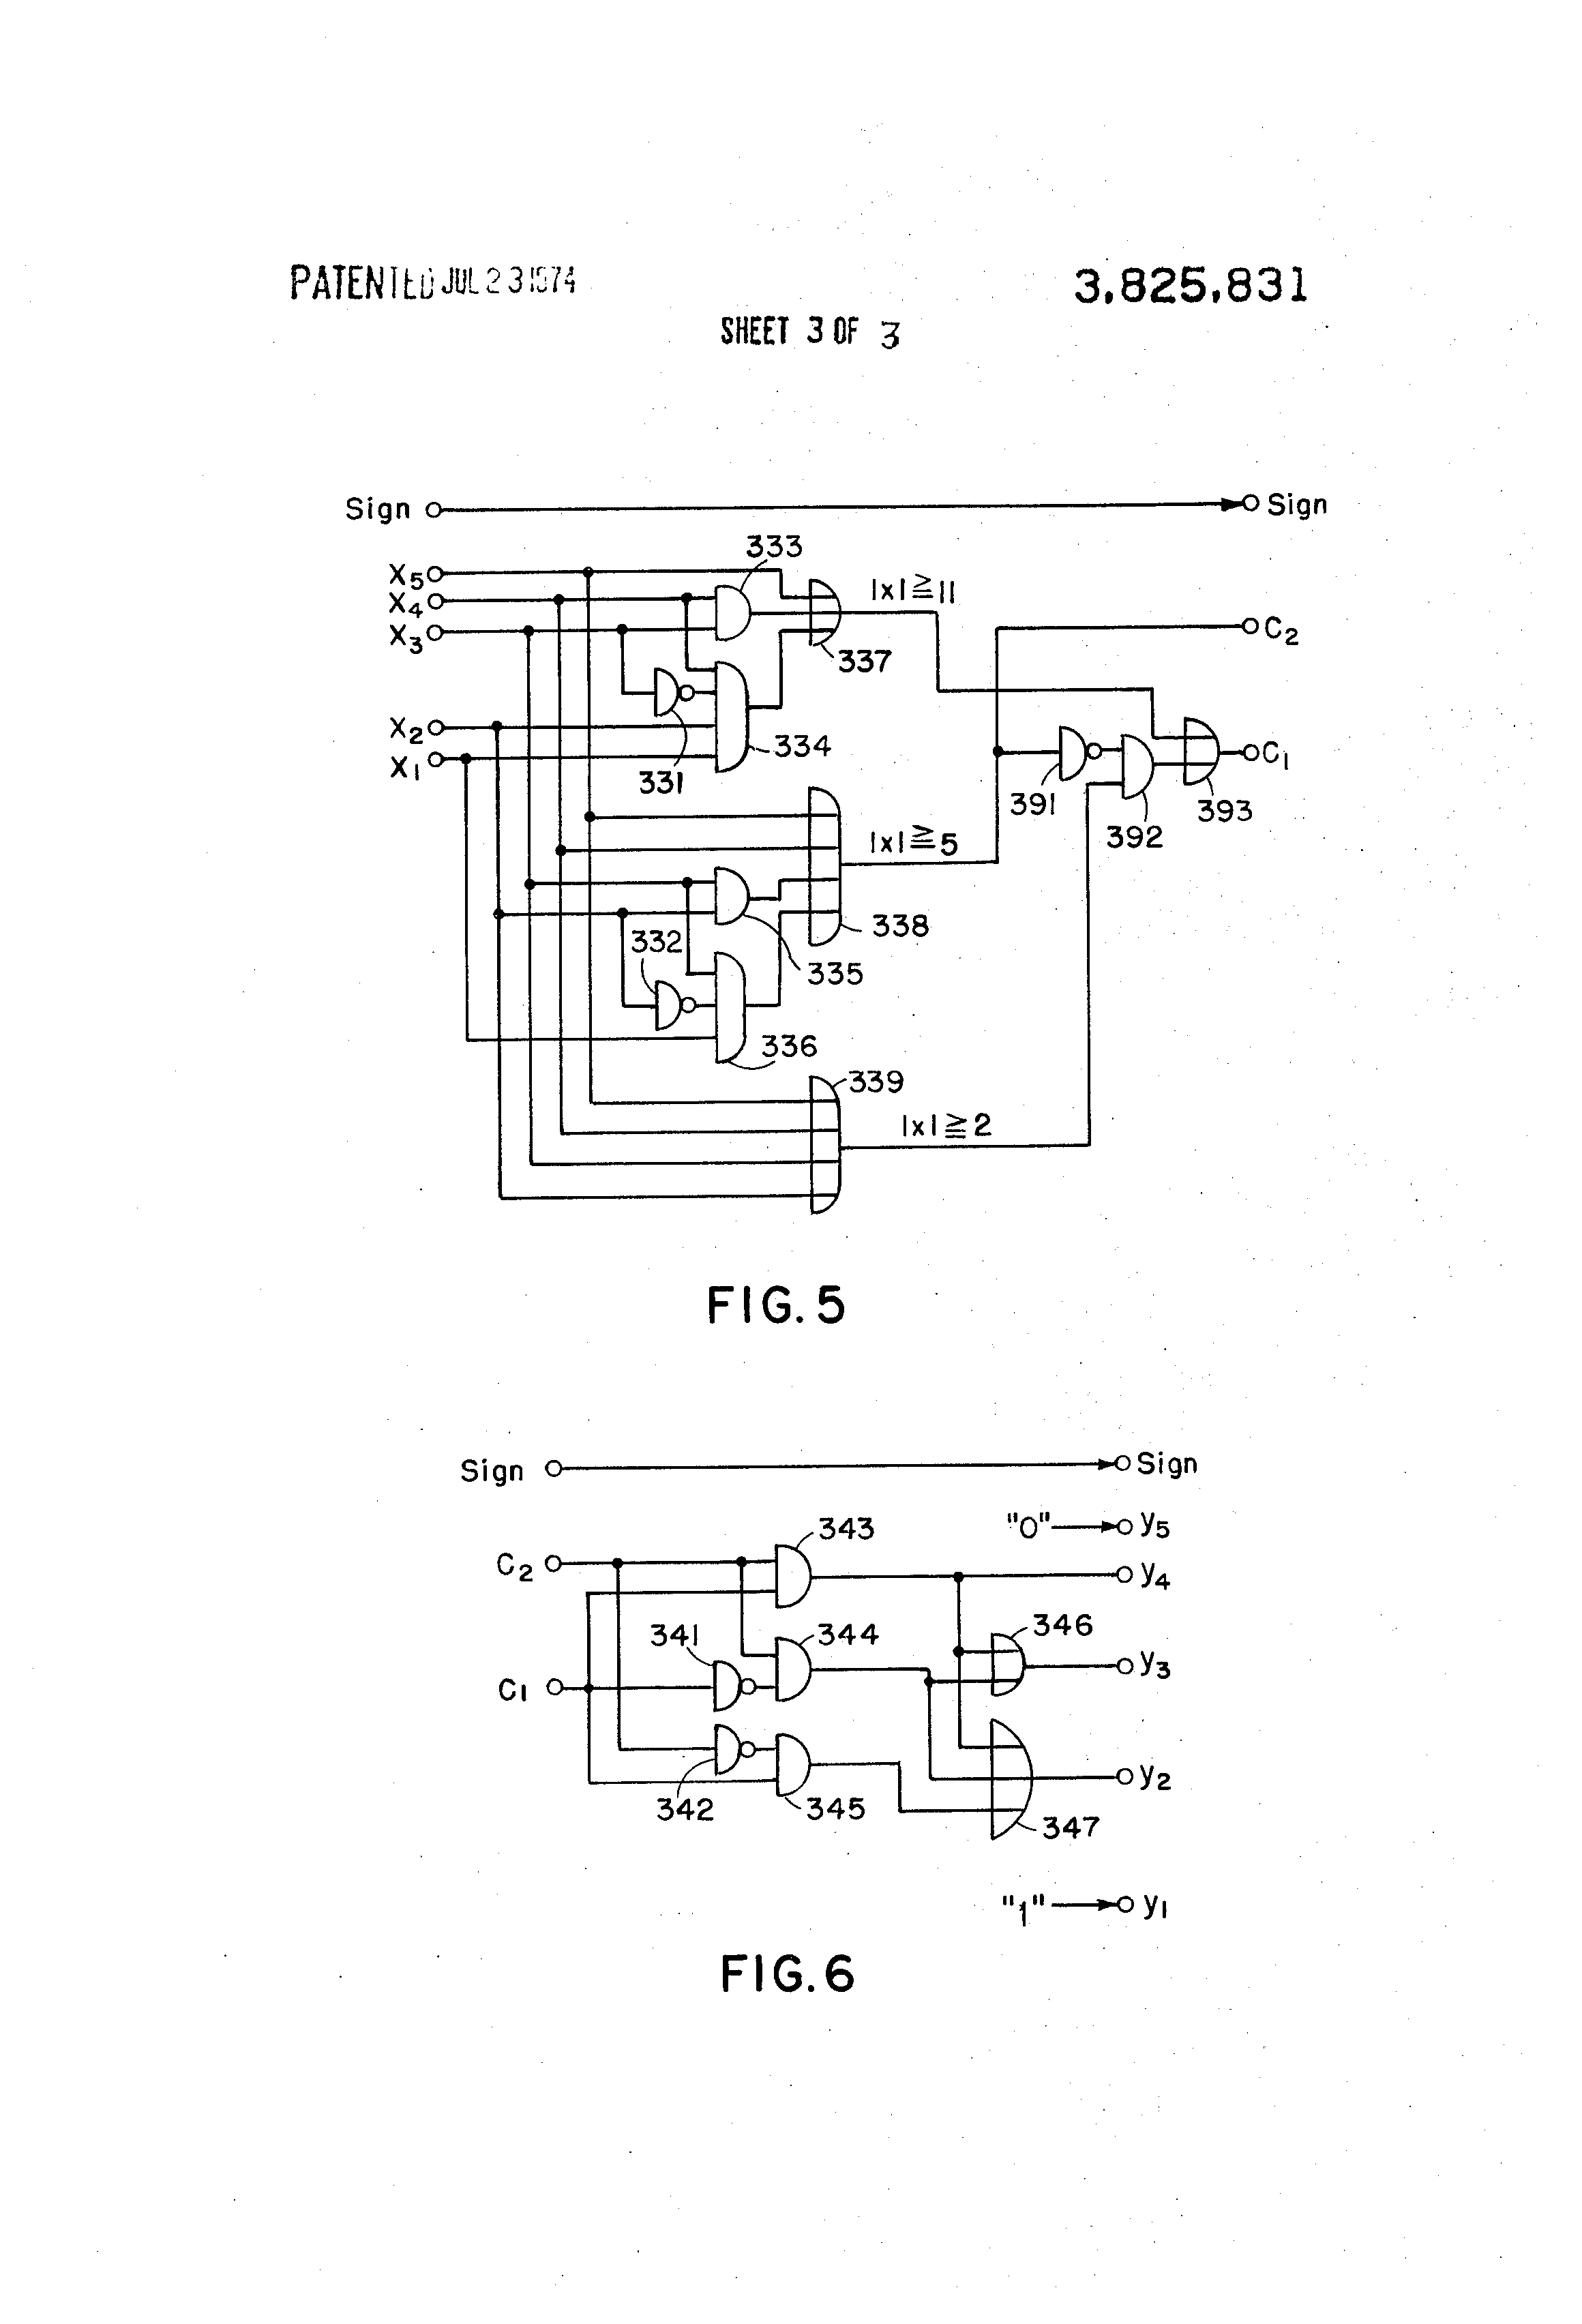 Brevet US3825831 - Differential pulse code modulation